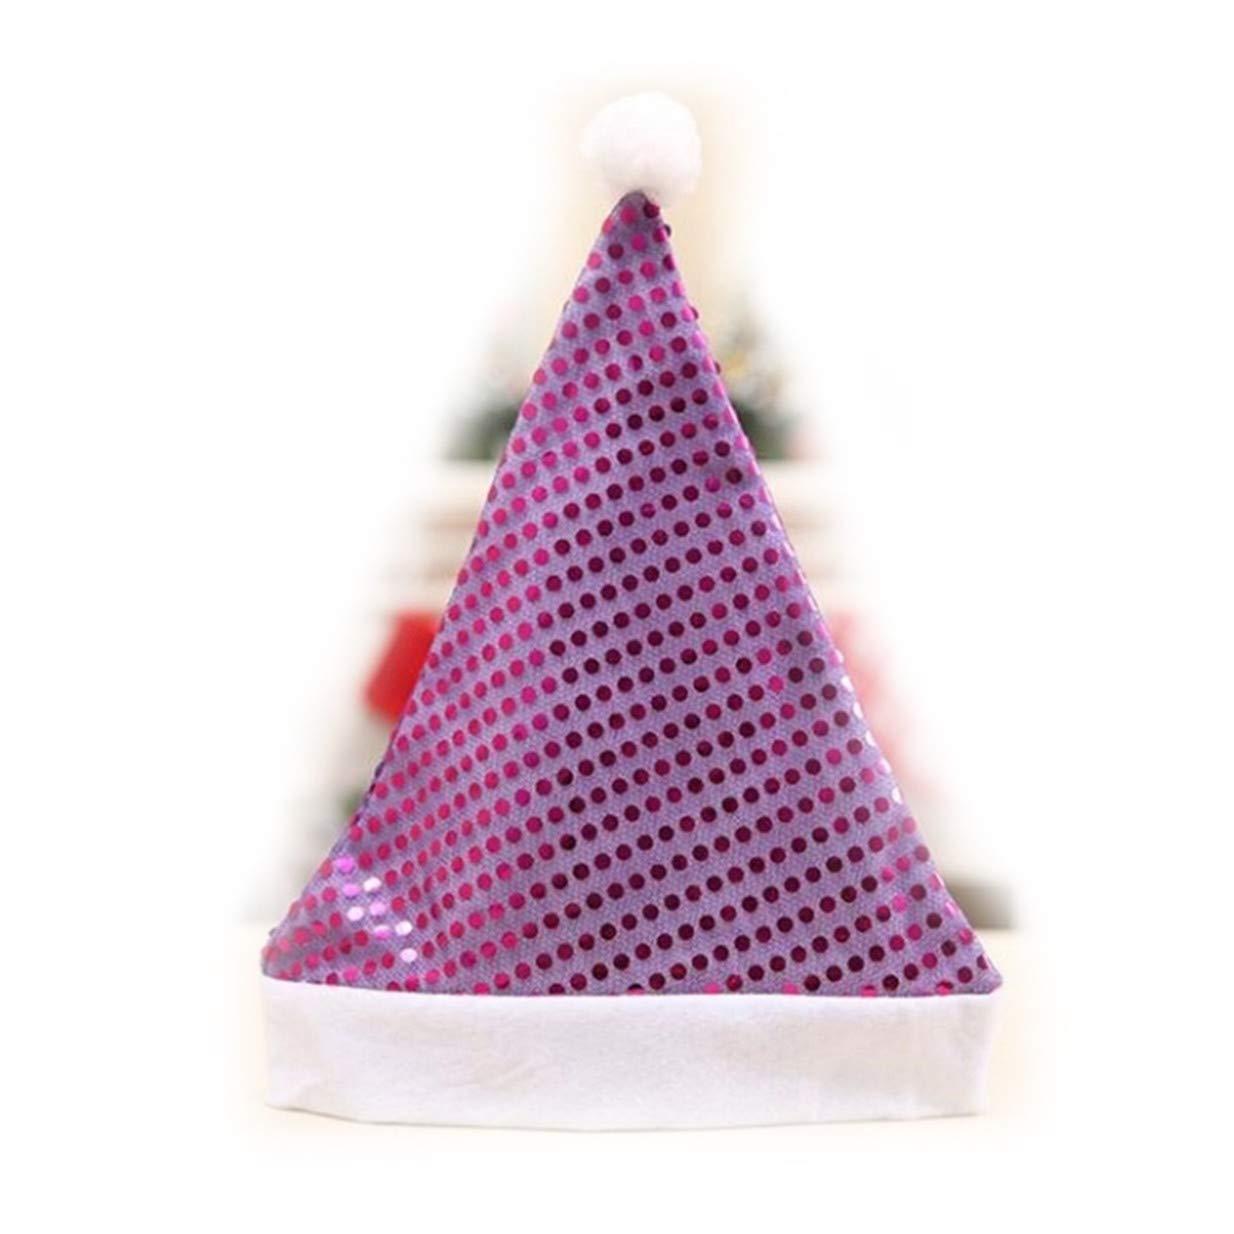 LALANG Santa Sparkle Sequin Hat Christmas Party Decorations Accessory(Purple)